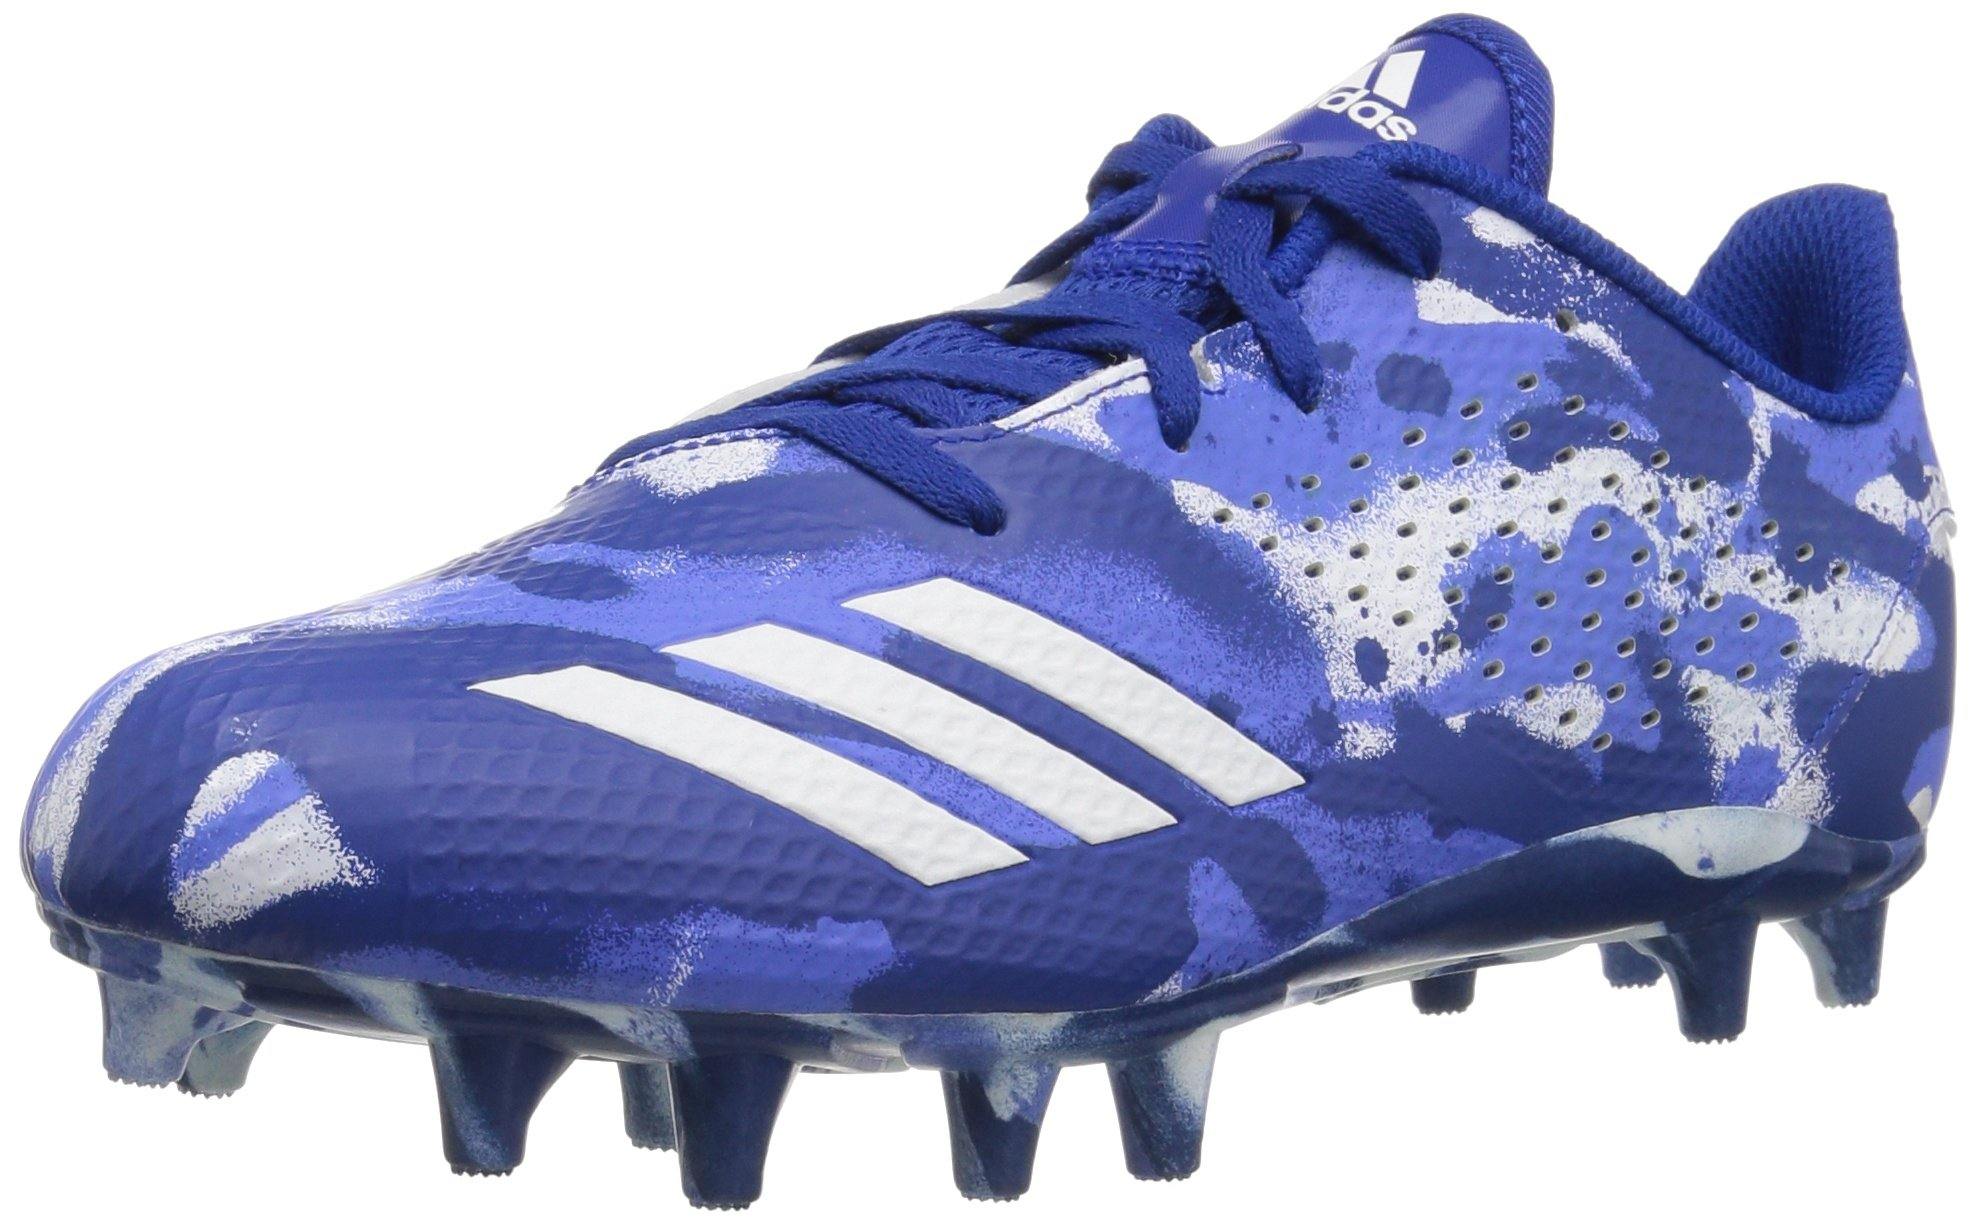 adidas Unisex Adizero 5-Star 7.0 Football Shoe, White/Collegiate Royal/hi-res Blue, 5 M US Big Kid